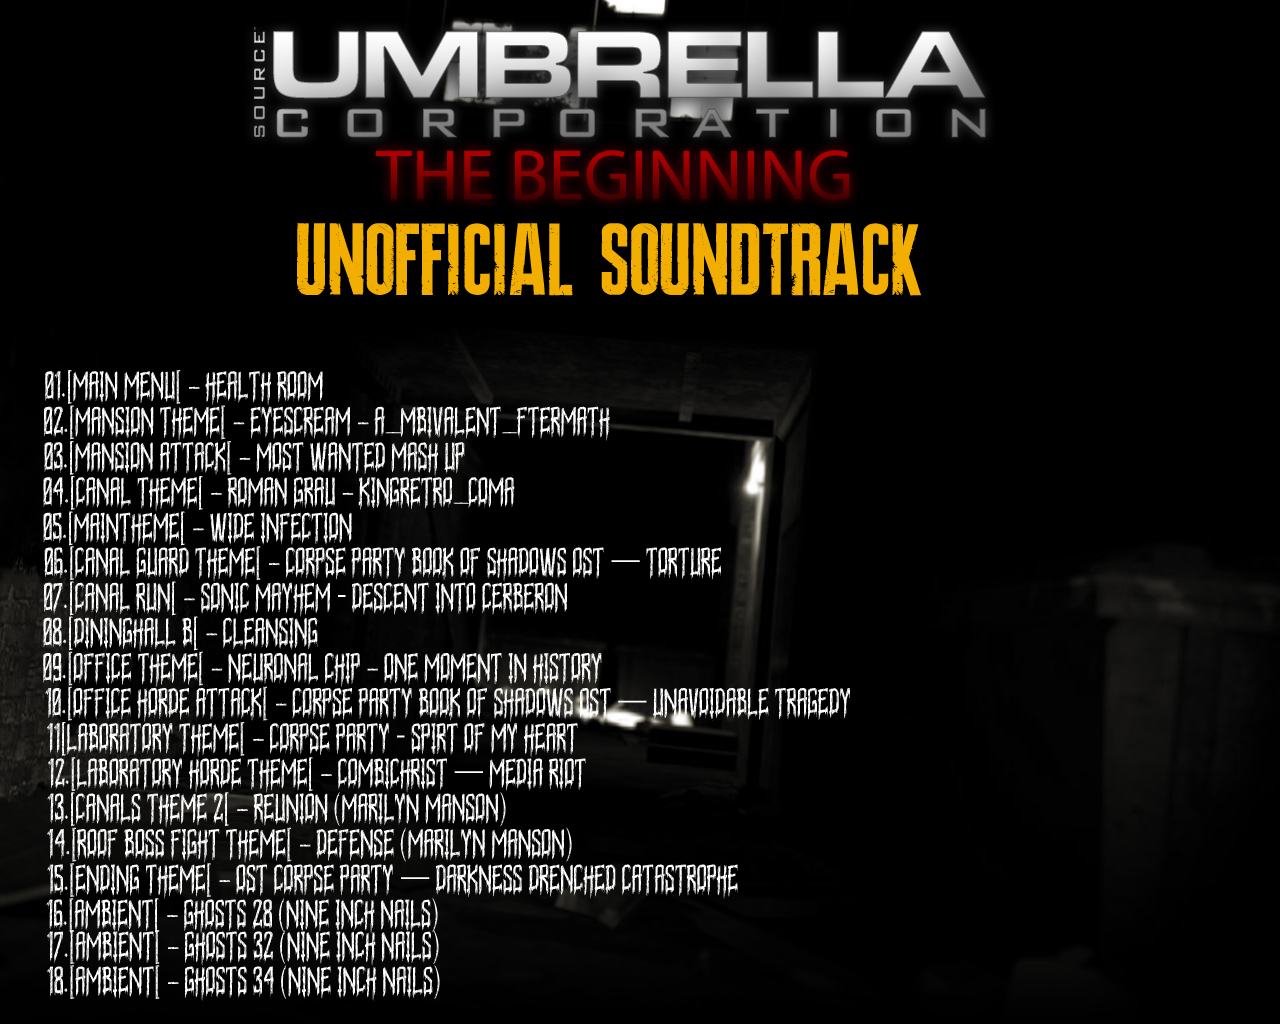 uc soundtrack